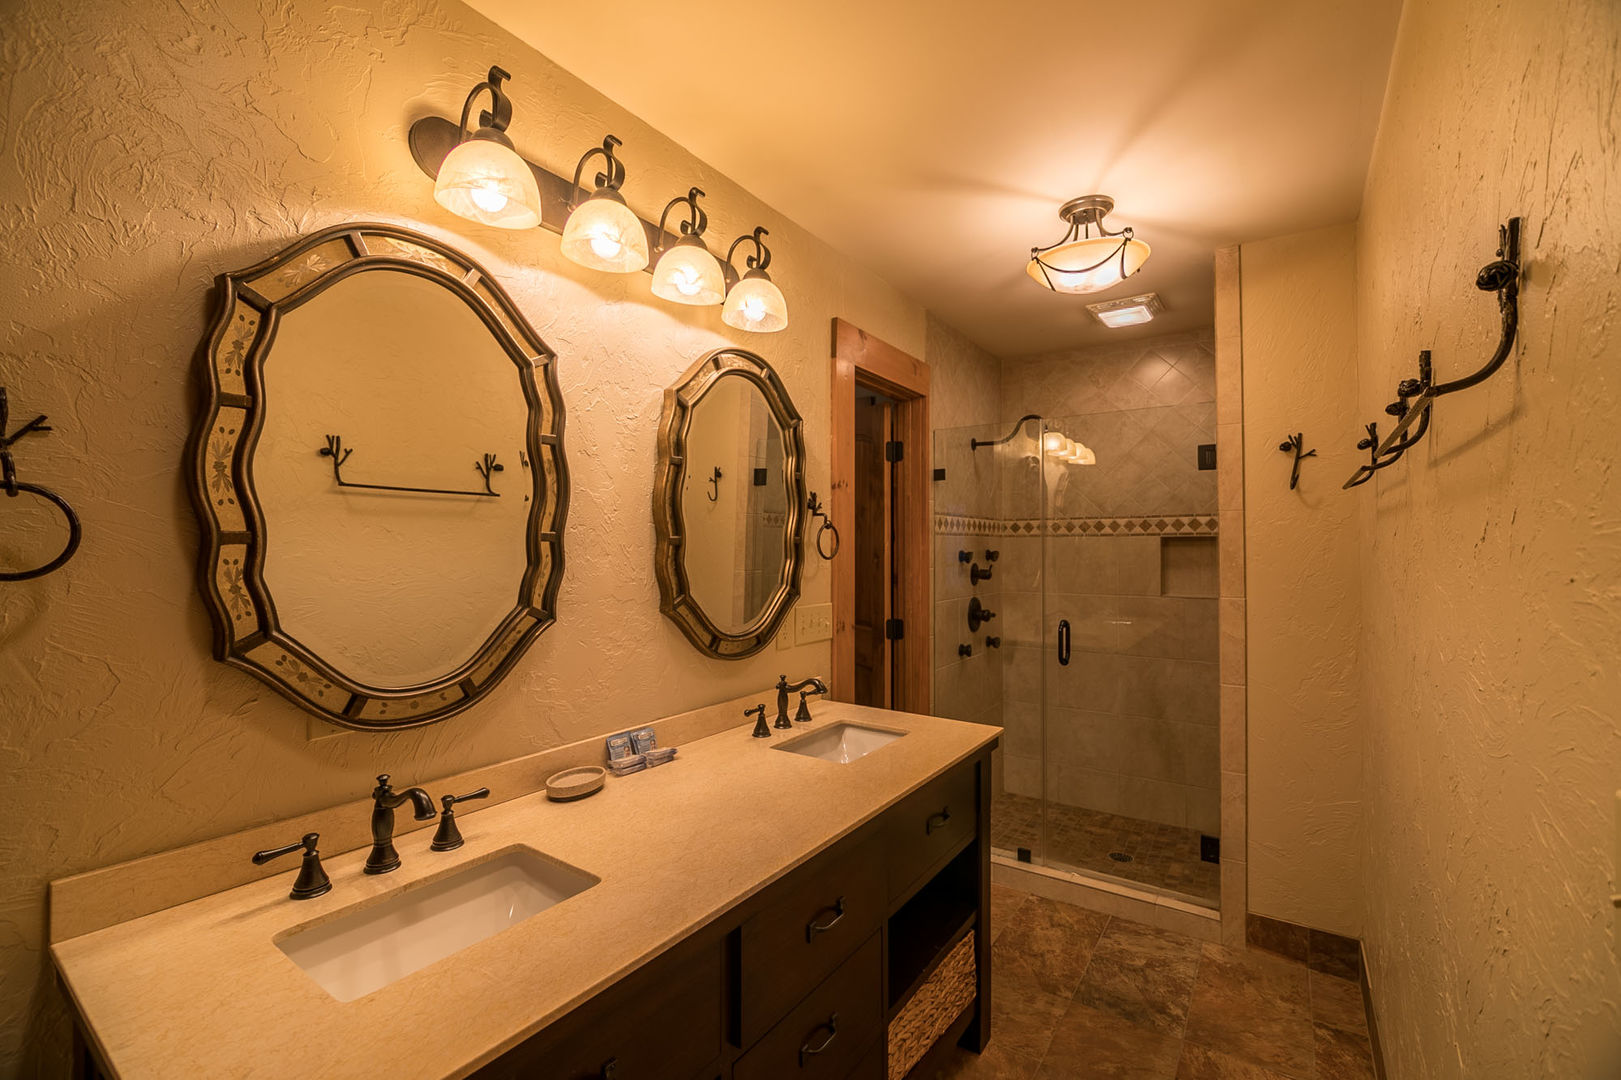 Bathroom with double vanities and shower